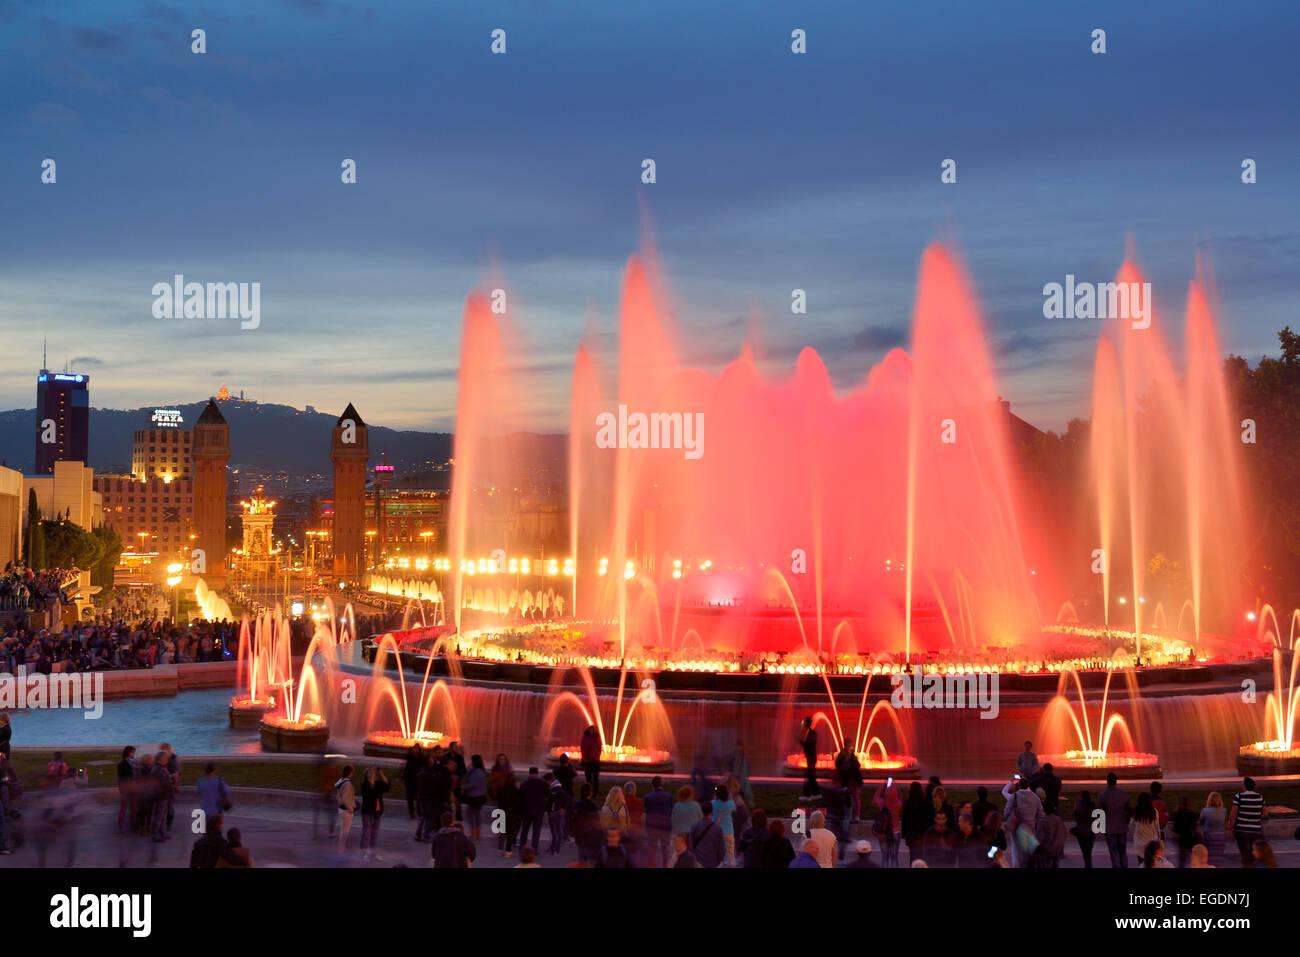 Illuminated fountain Font Magica and Palau Nacional at night, National Museum, Montjuic, Barcelona, Catalonia, Spain - Stock Image